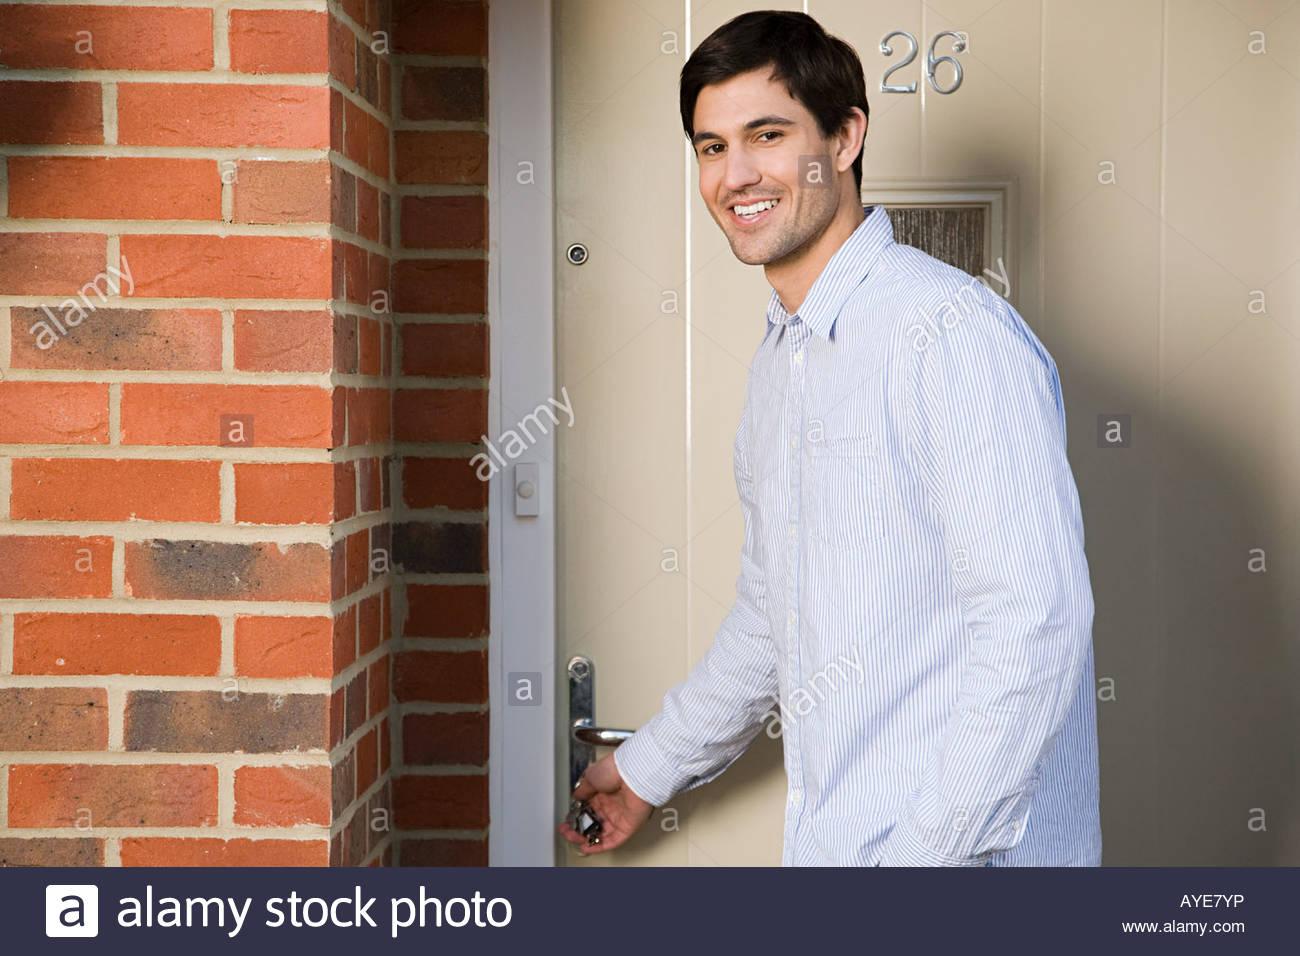 Man opening front door Stock Photo, Royalty Free Image